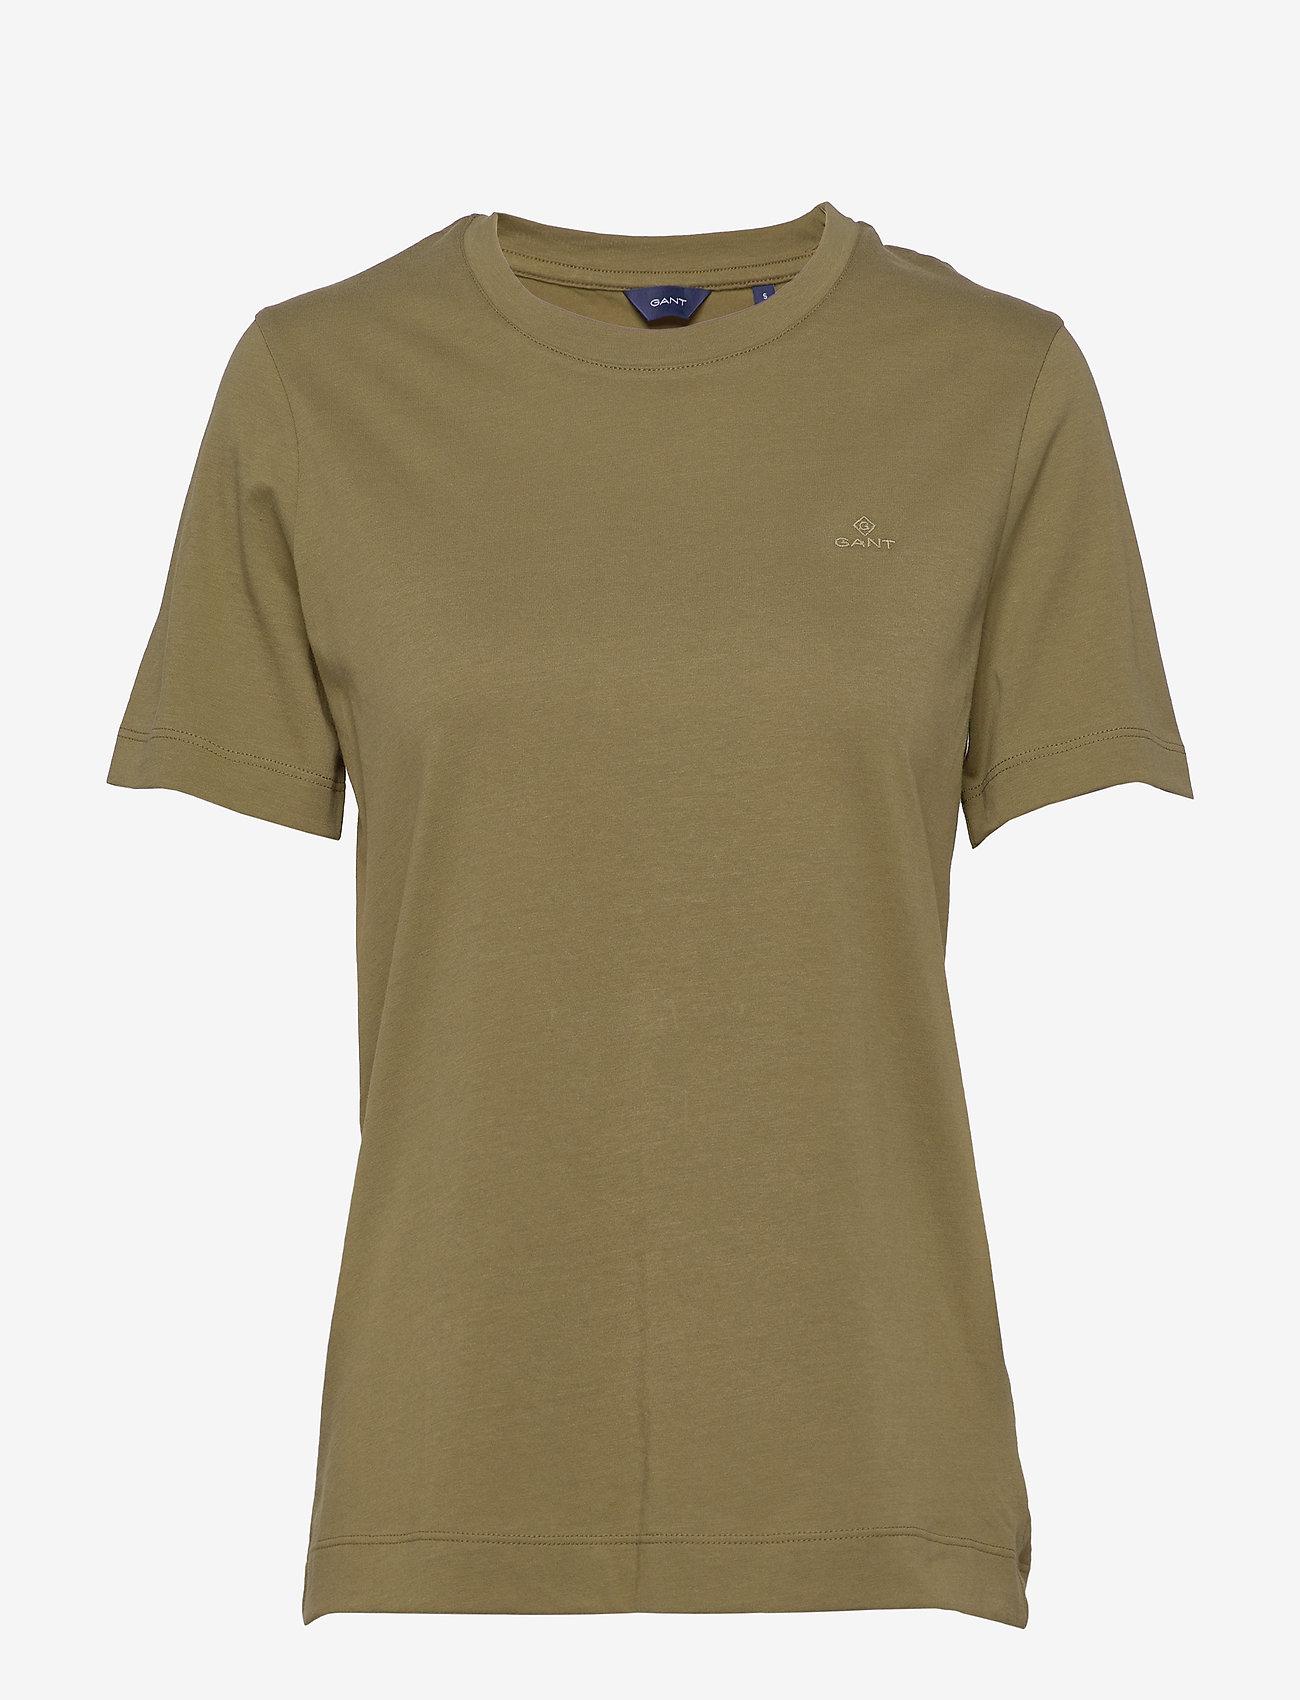 GANT - ORIGINAL SS T-SHIRT - basic t-shirts - olive green - 0